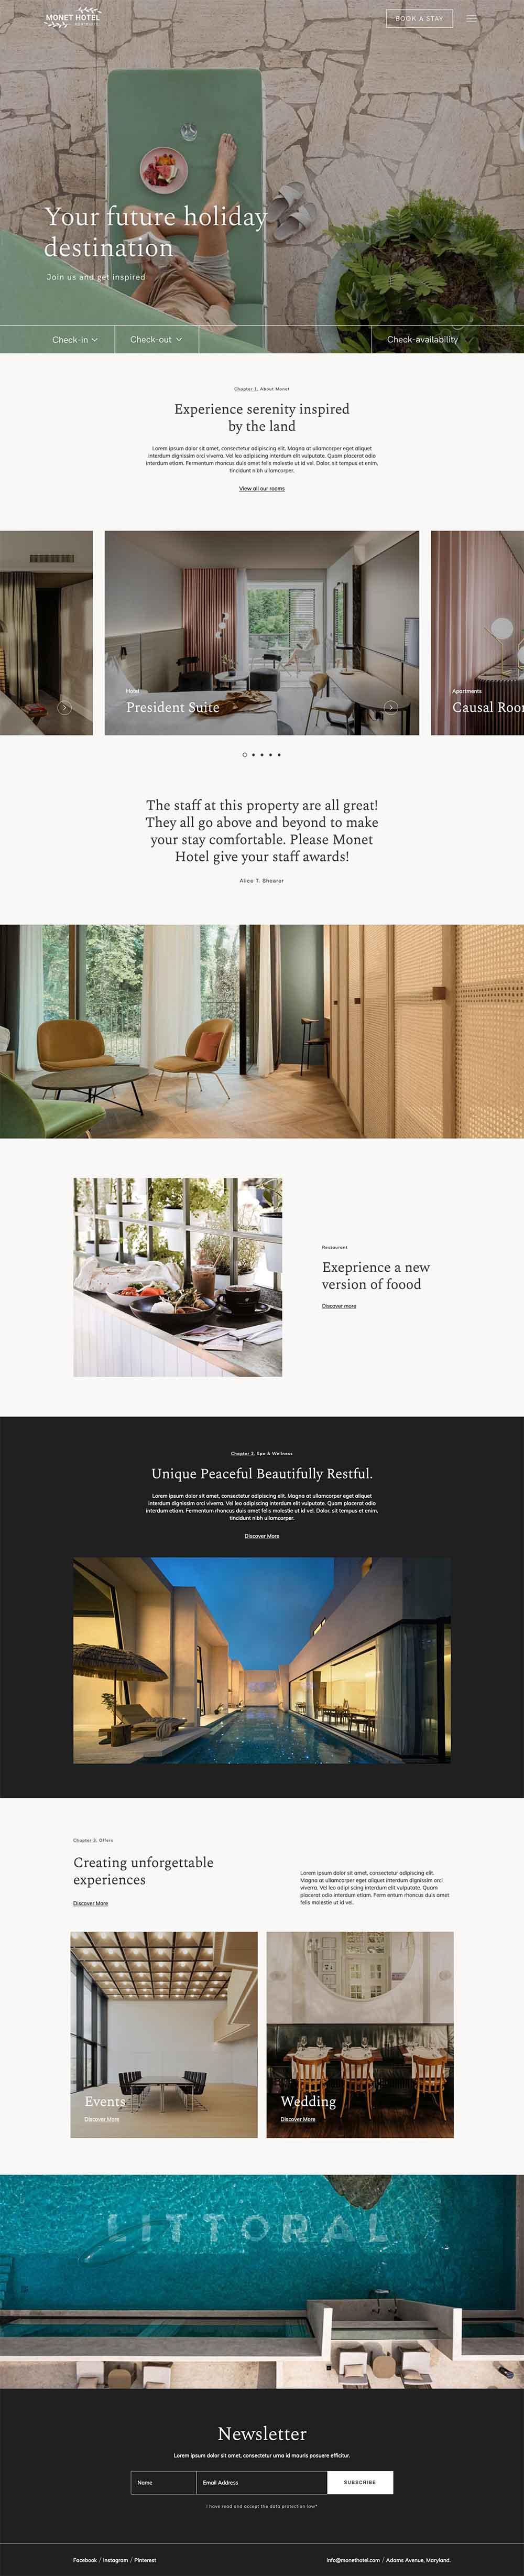 Monet Hotel – Luxurious Hotel Demo Website for WordPress